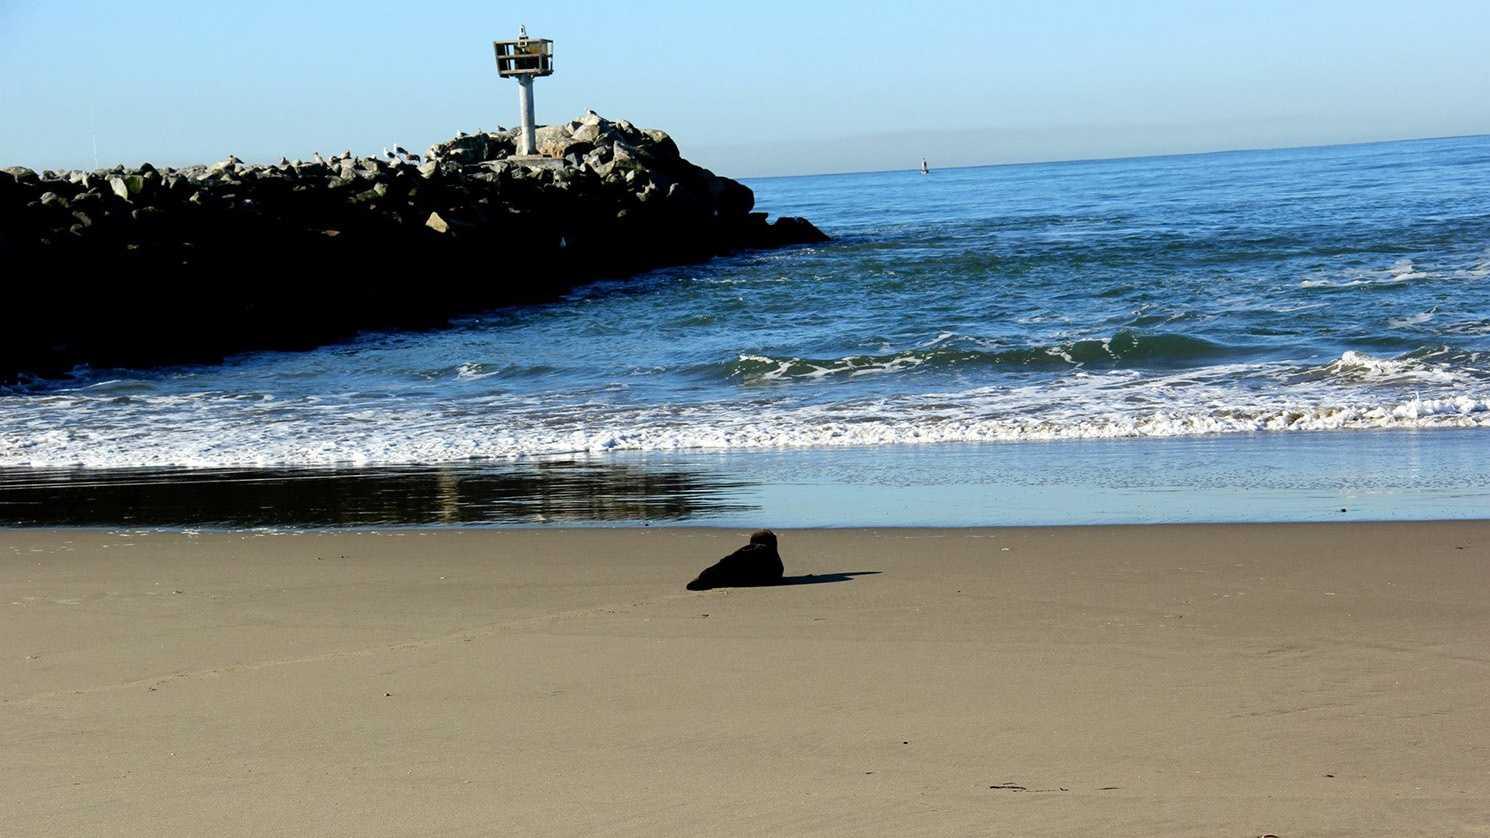 A sea otter makes it way toward the ocean in Moss Landing.